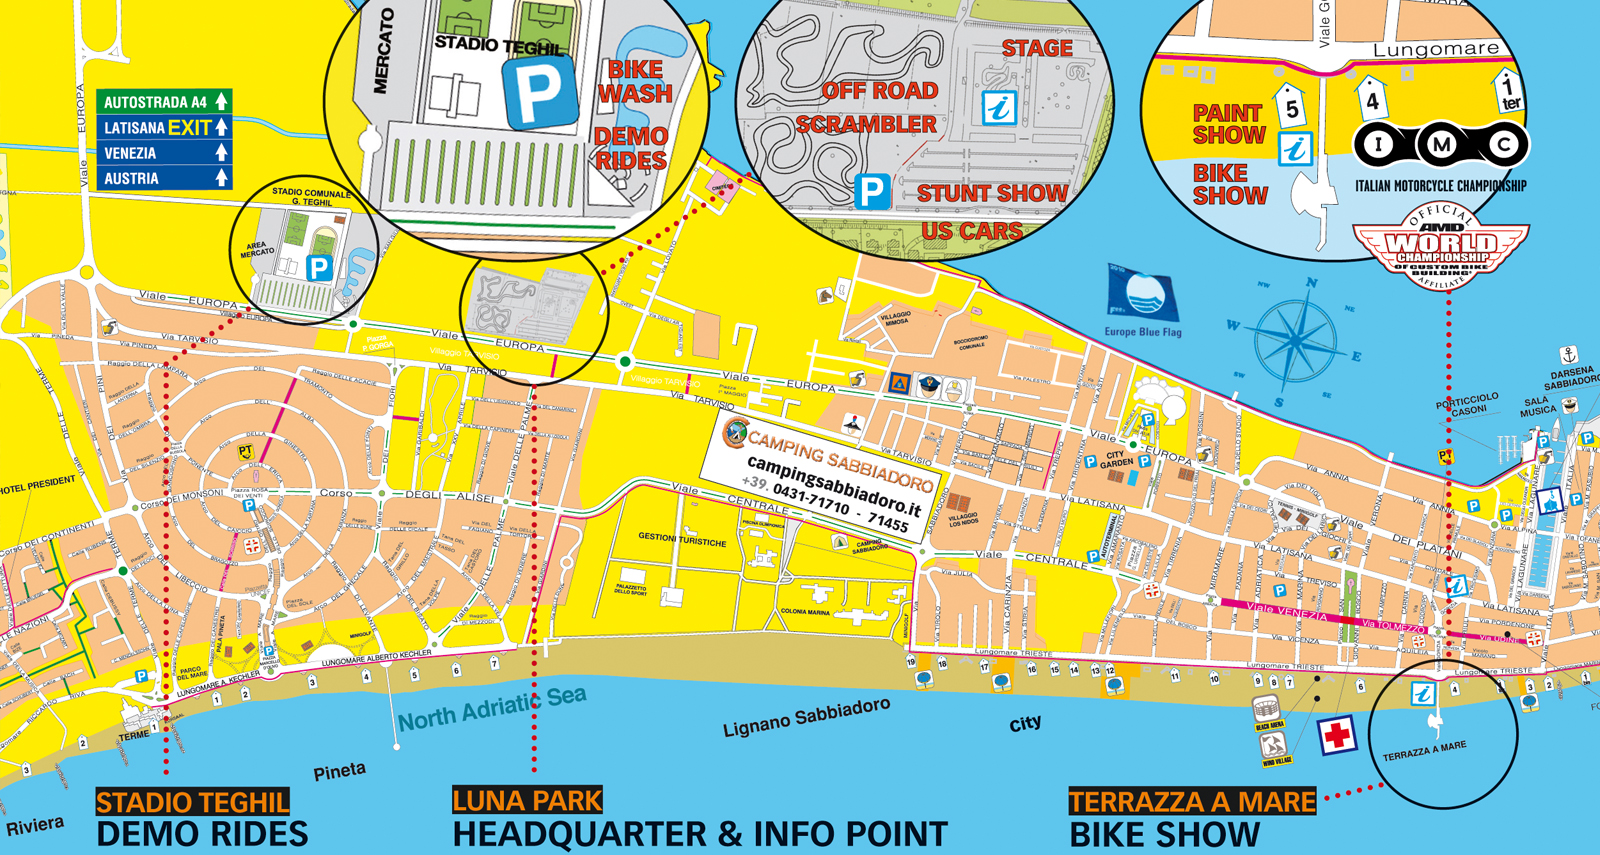 29 Bikerfest International Lignano Sabbiadoro